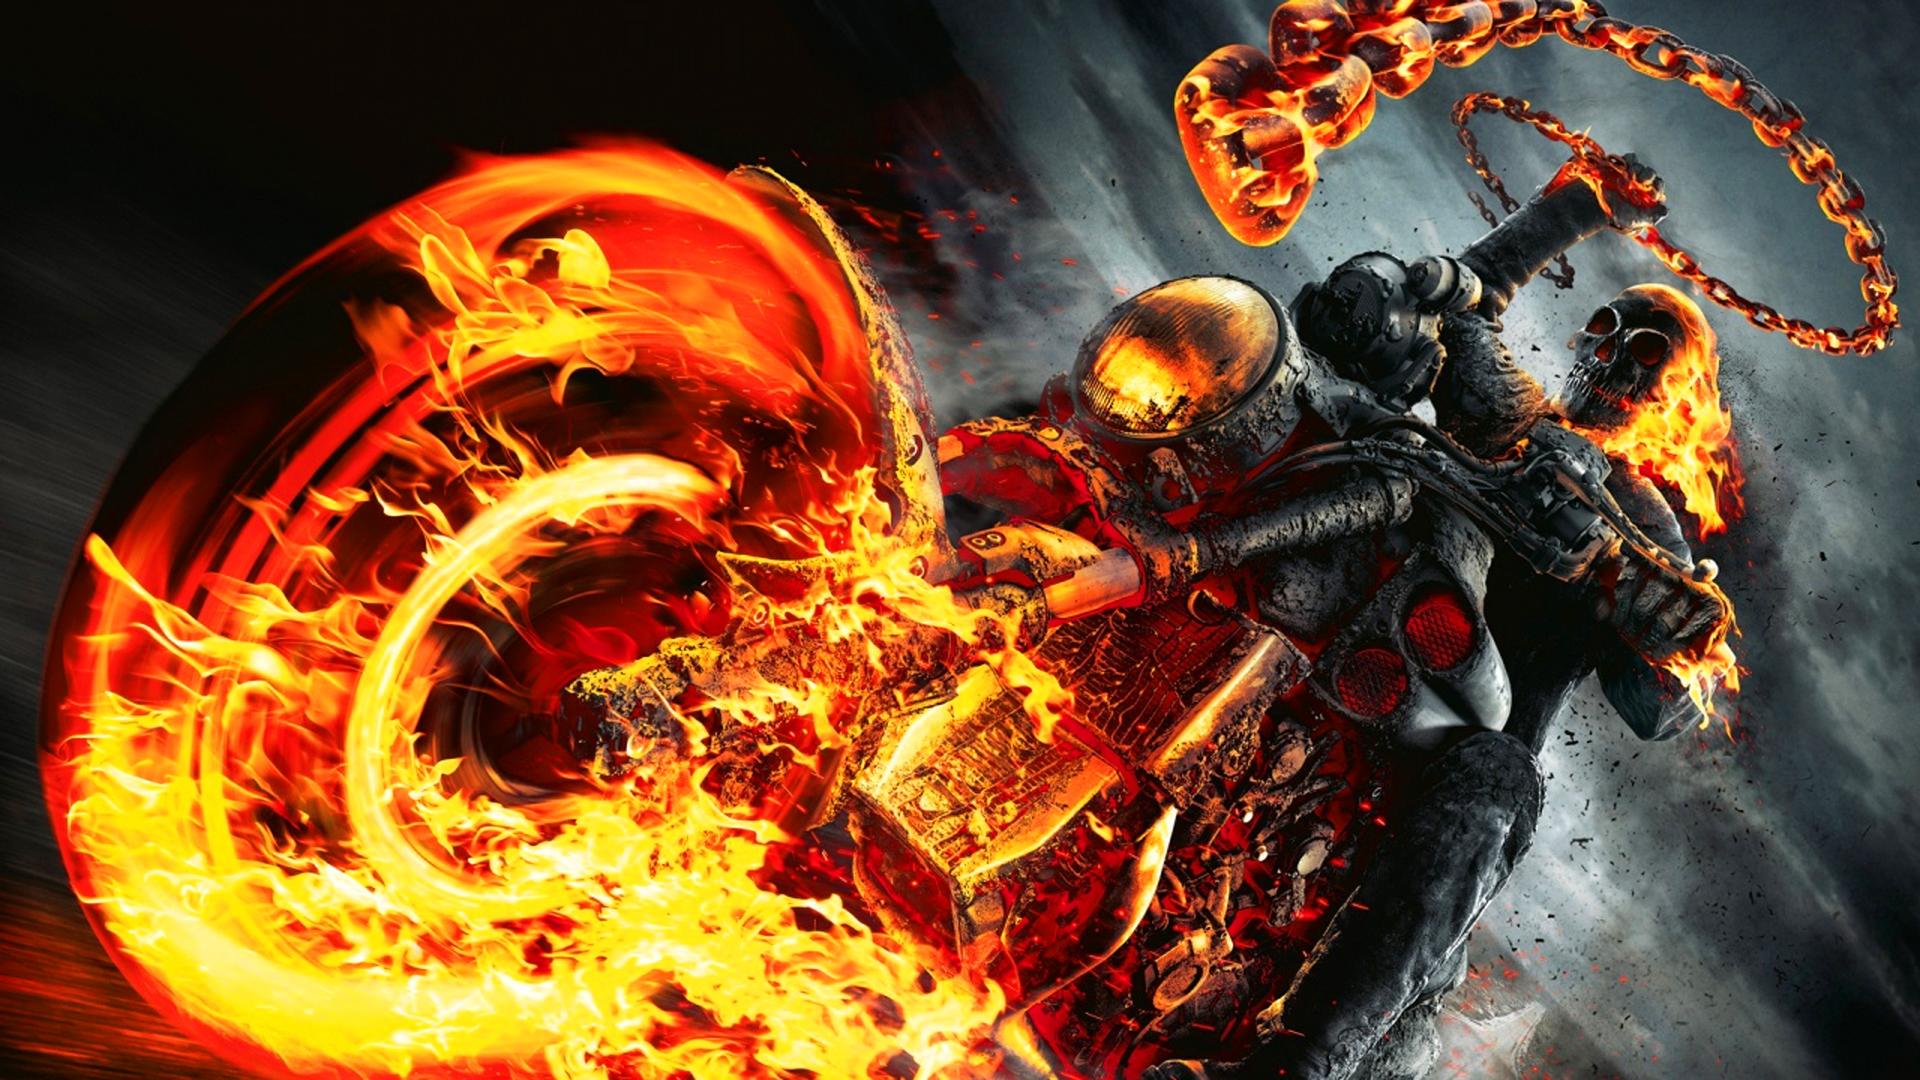 Ghost Rider HD Wallpaper 1920x1080